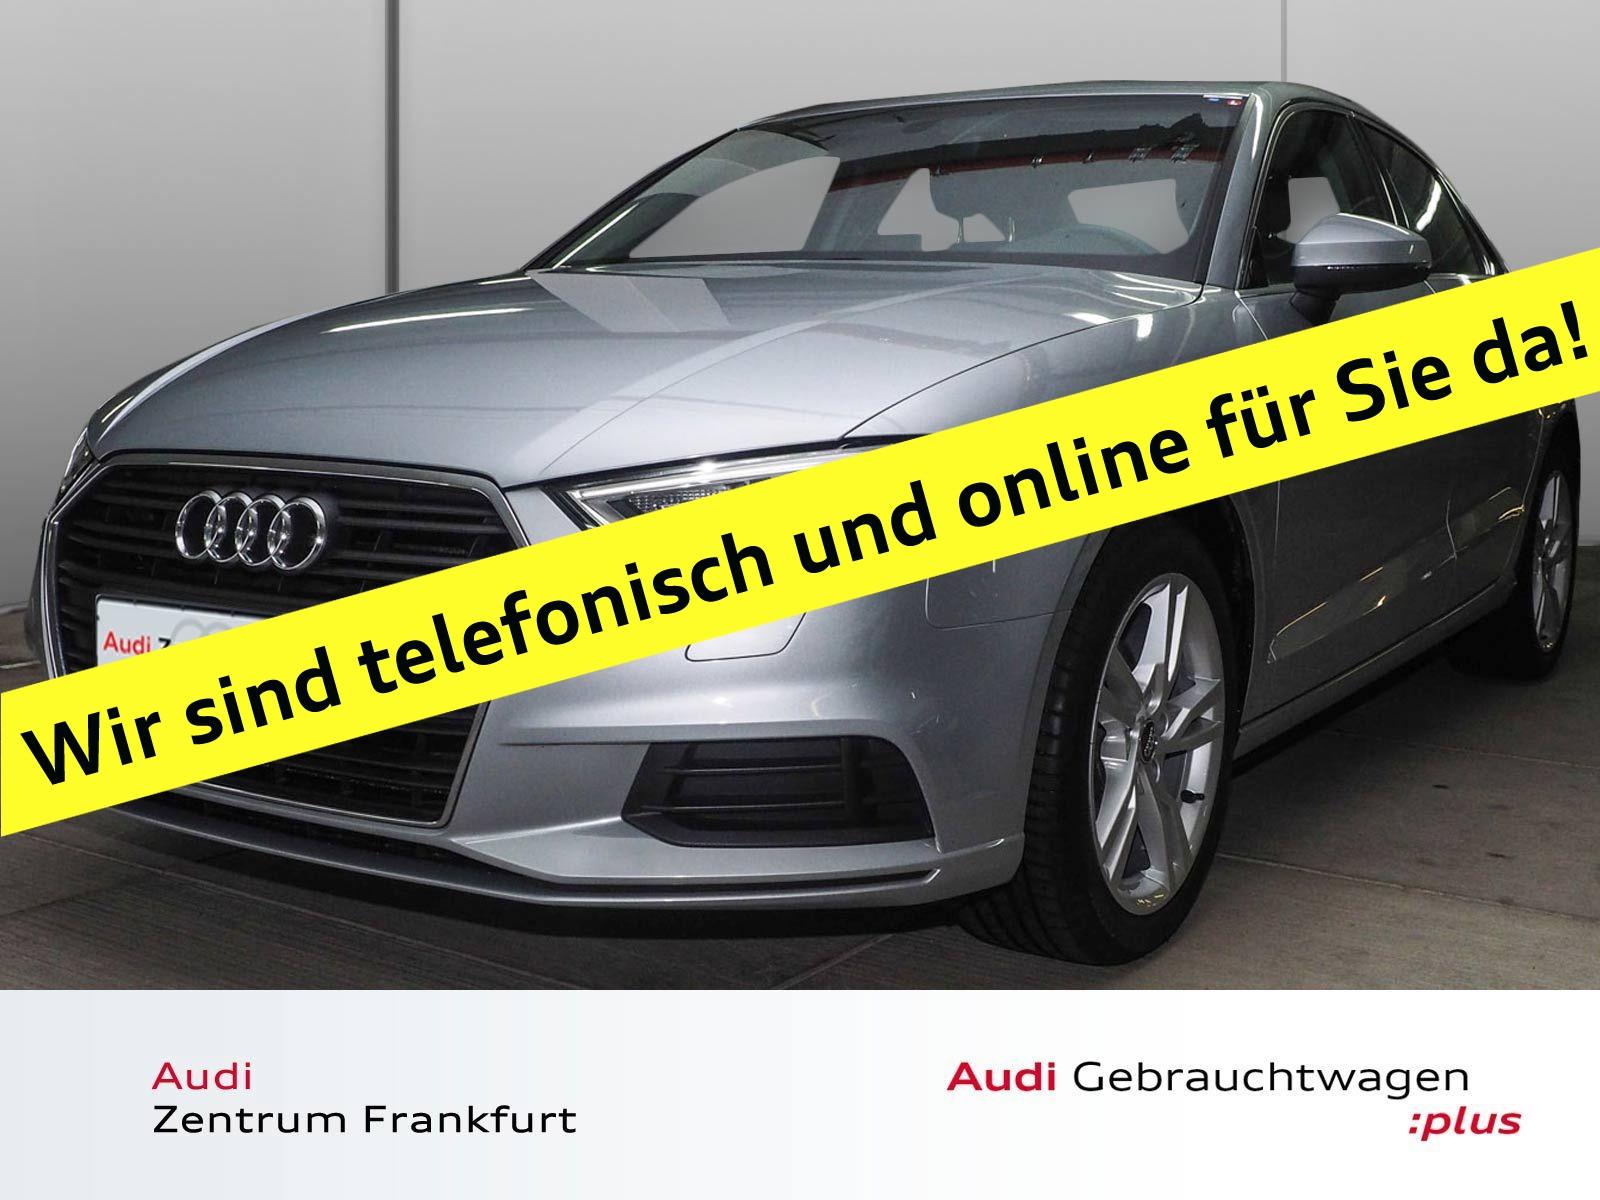 Audi A3 Limousine 30 TFSI Xenon PDC Sitzheizung Bluetooth Tempomat, Jahr 2018, Benzin